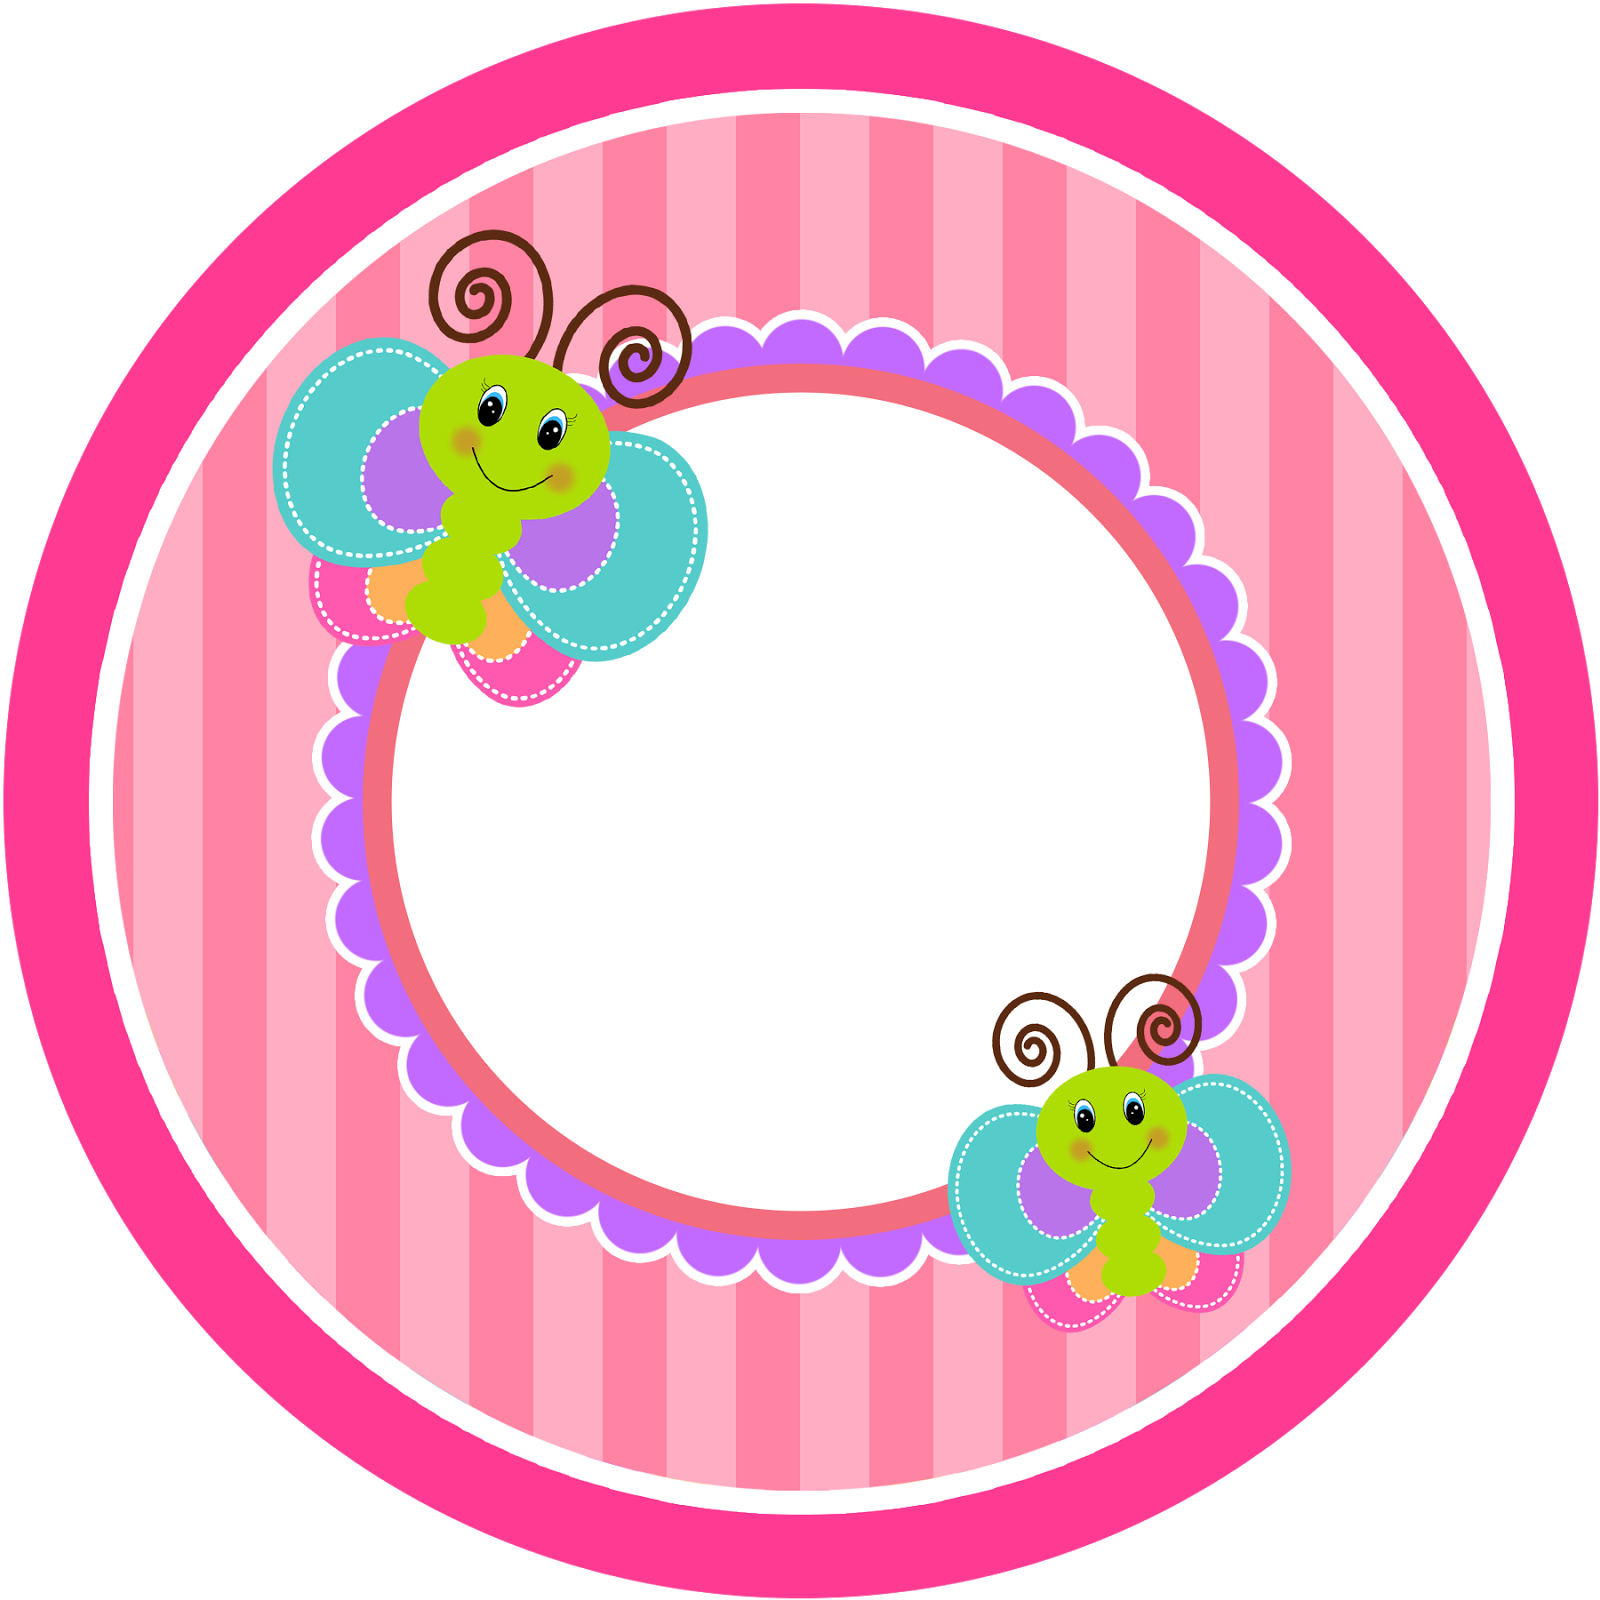 Divertida Mariposa: Etiquetas para Candy Buffet para Imprimir Gratis ...